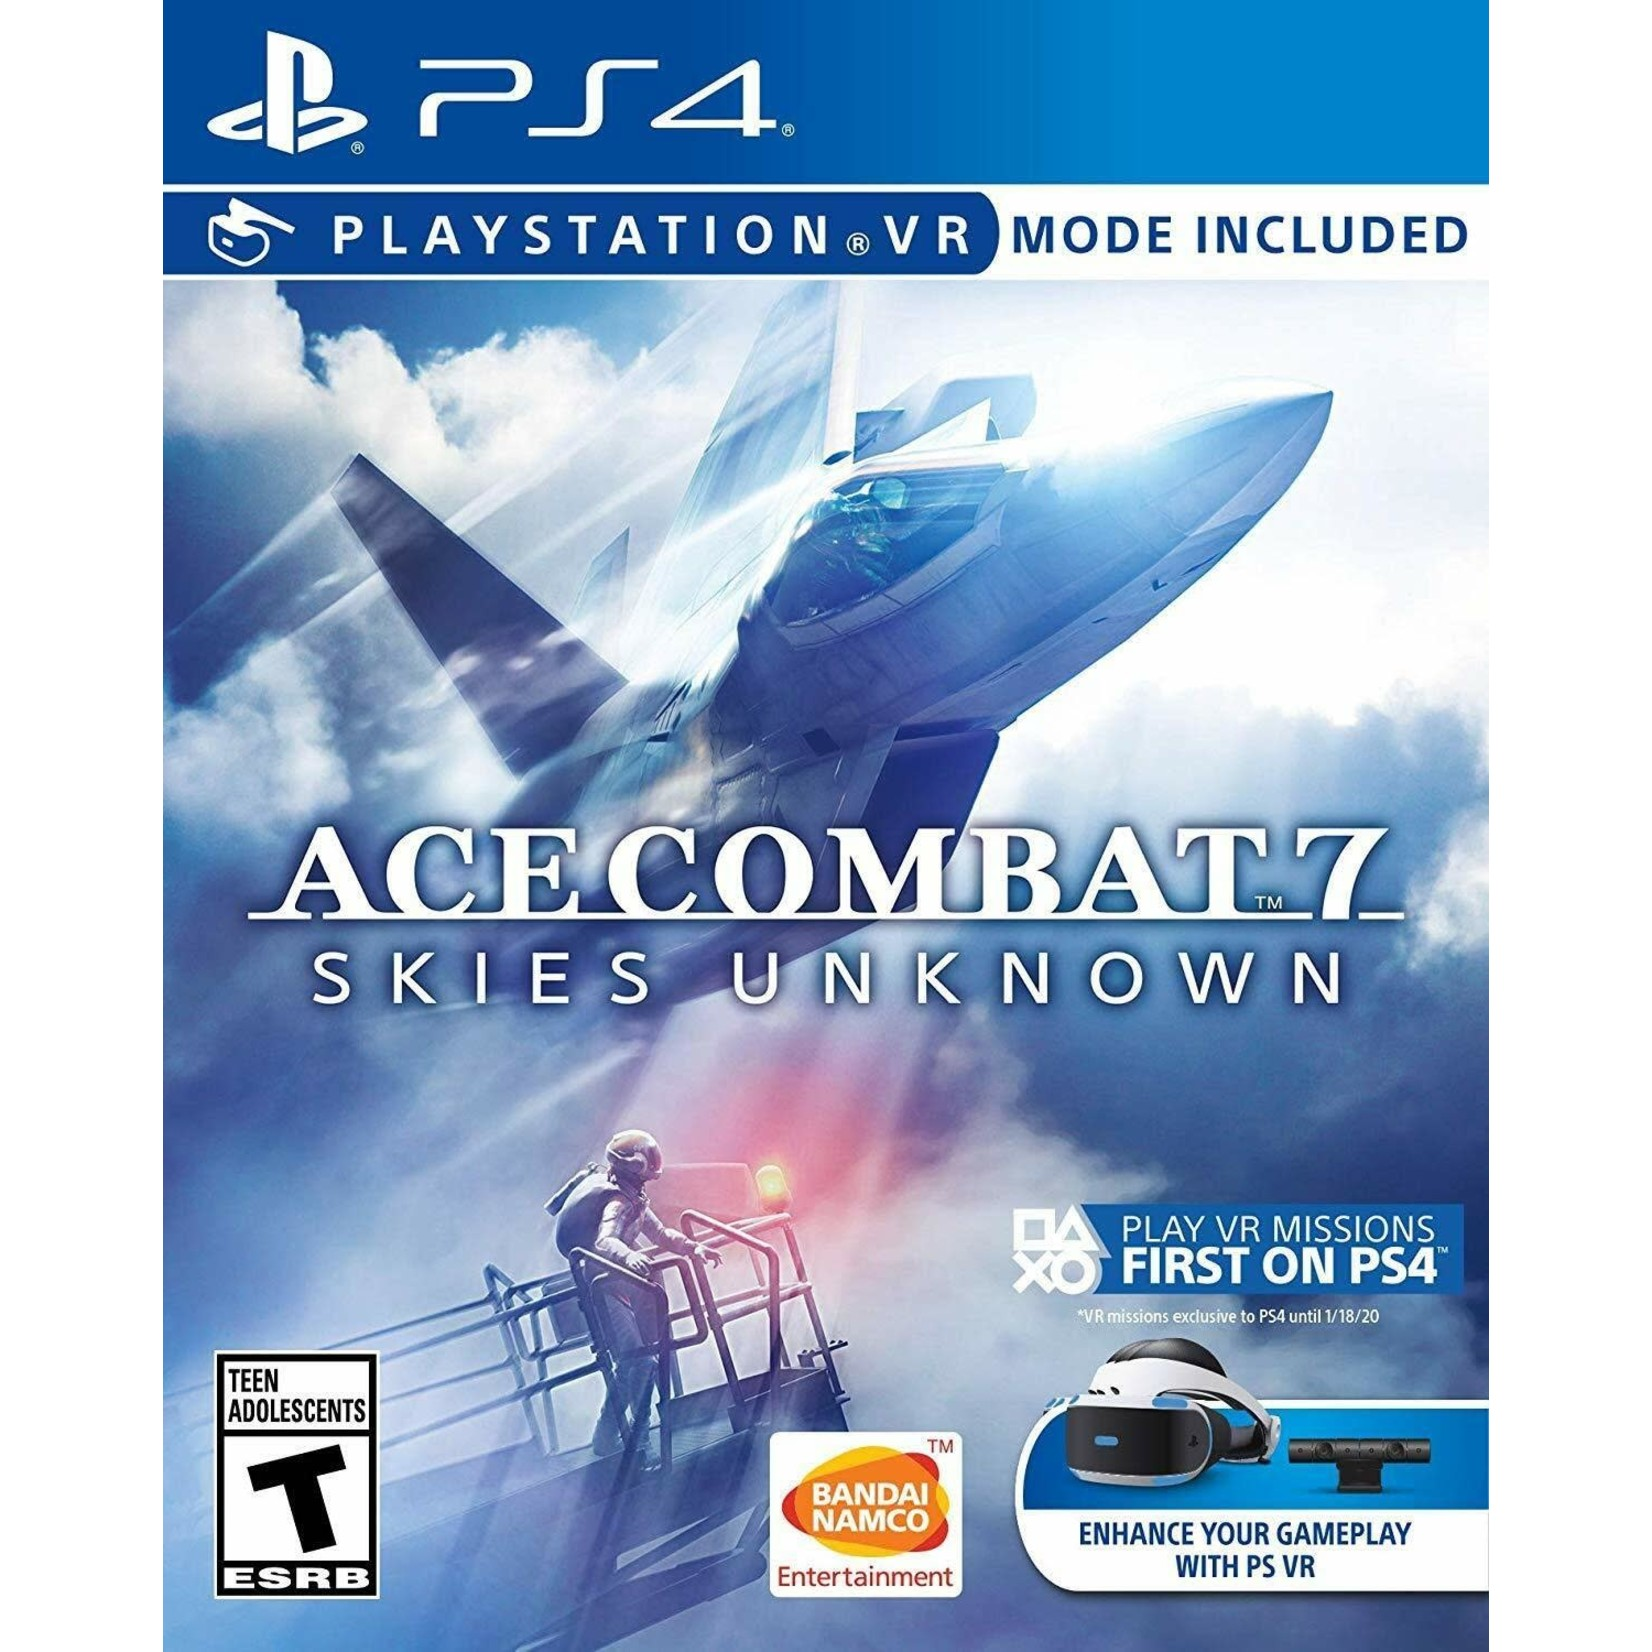 PS4U-Ace Combat 7 Skies Unknown